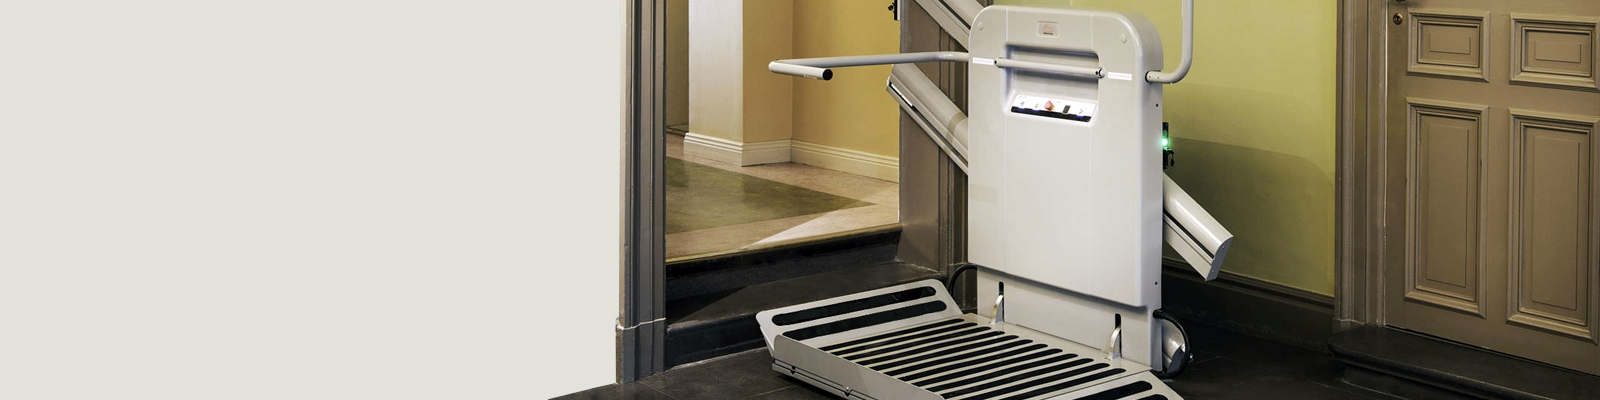 Cibes S300 Ανελκυστήρας Σκάλας